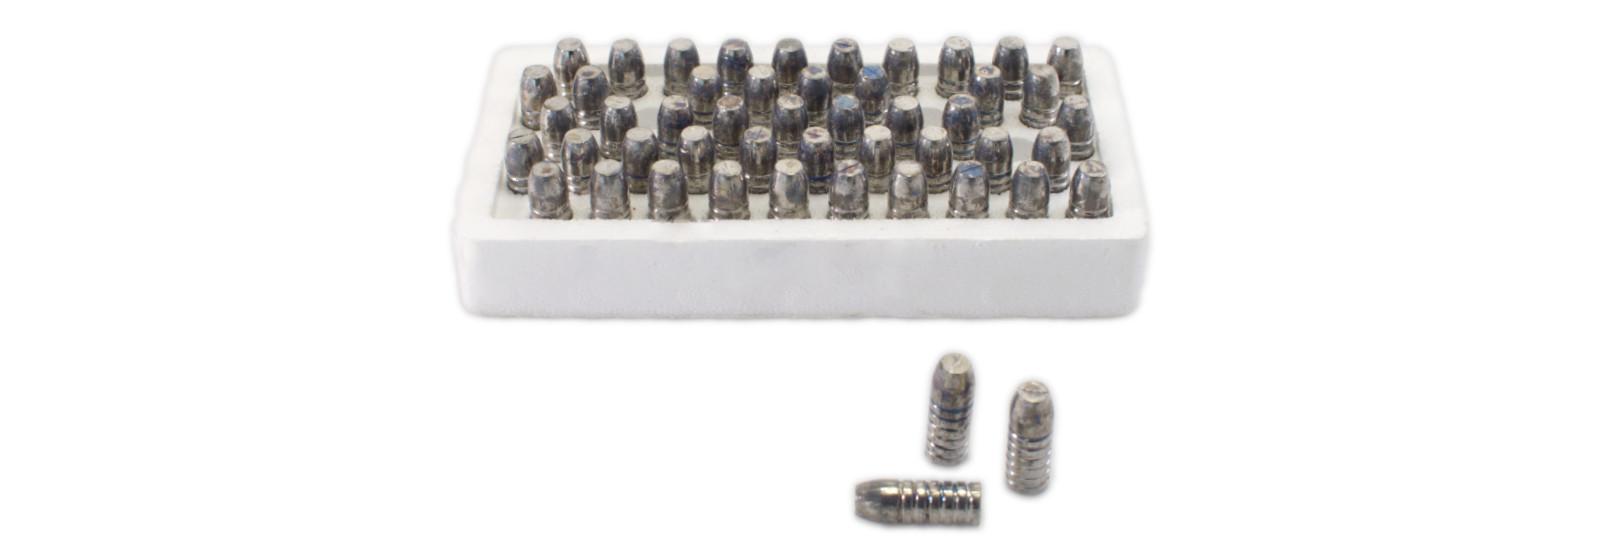 Set 50 conical bullets for breech loading .458/535 grs